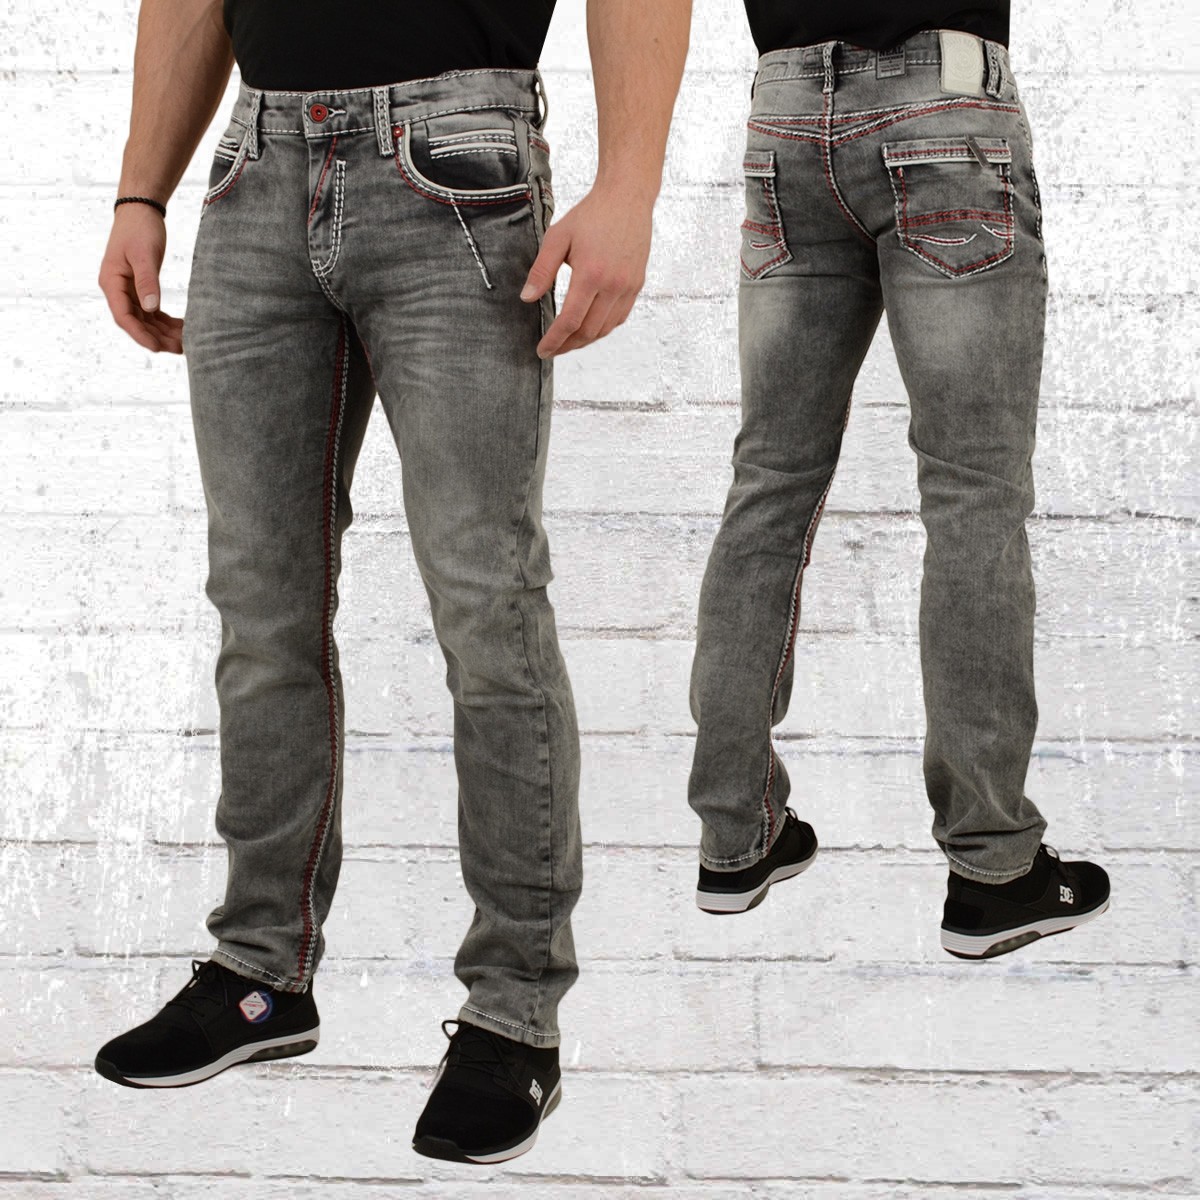 heiß-verkaufendes echtes Original wählen Rabatt Order now | Rusty Neal Mens Jeans New York 45 grey